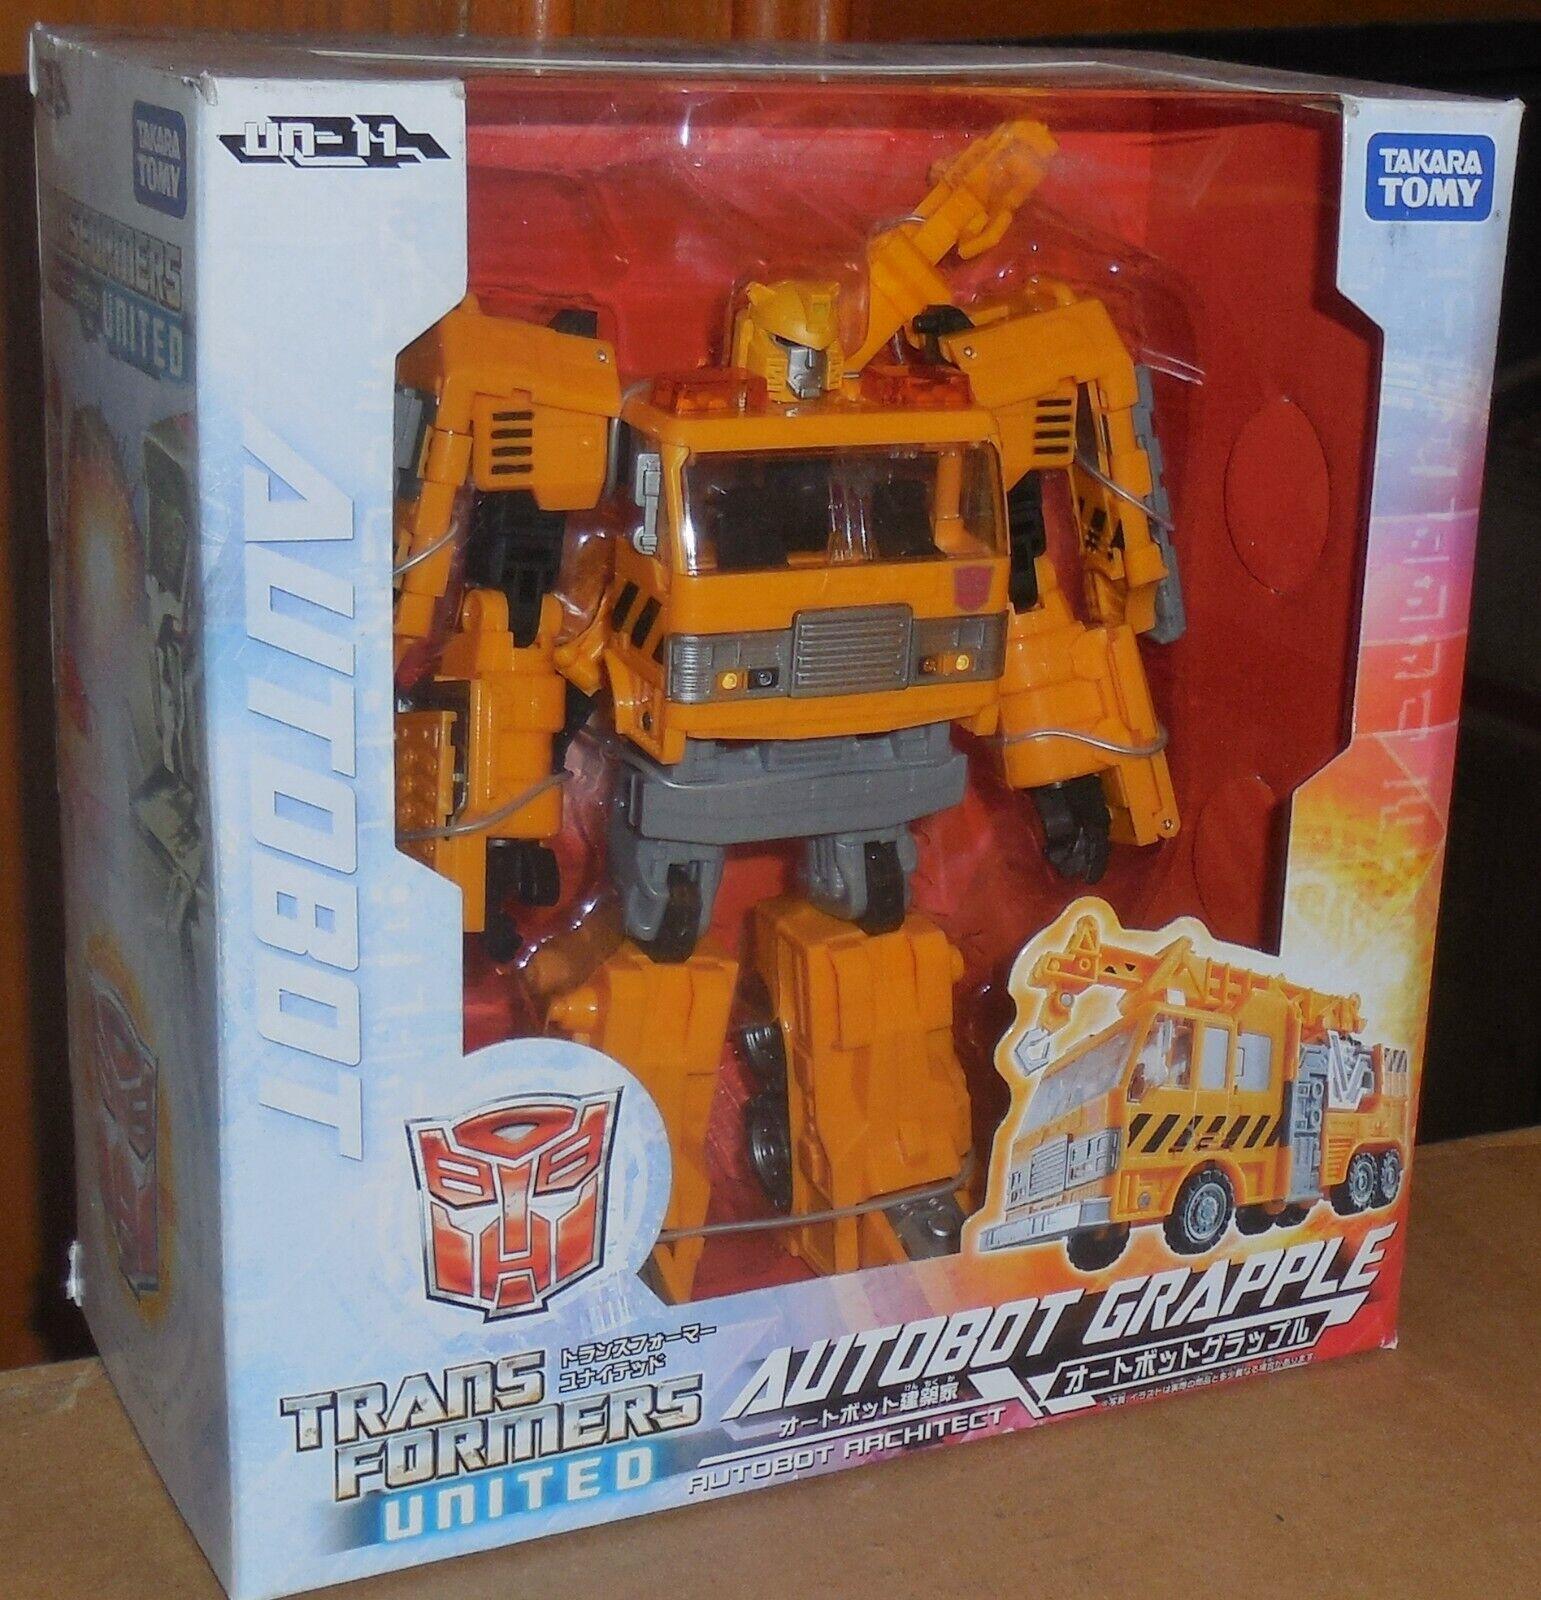 Transformers Takara United Grapple Misb Neu Un-11 Voyager